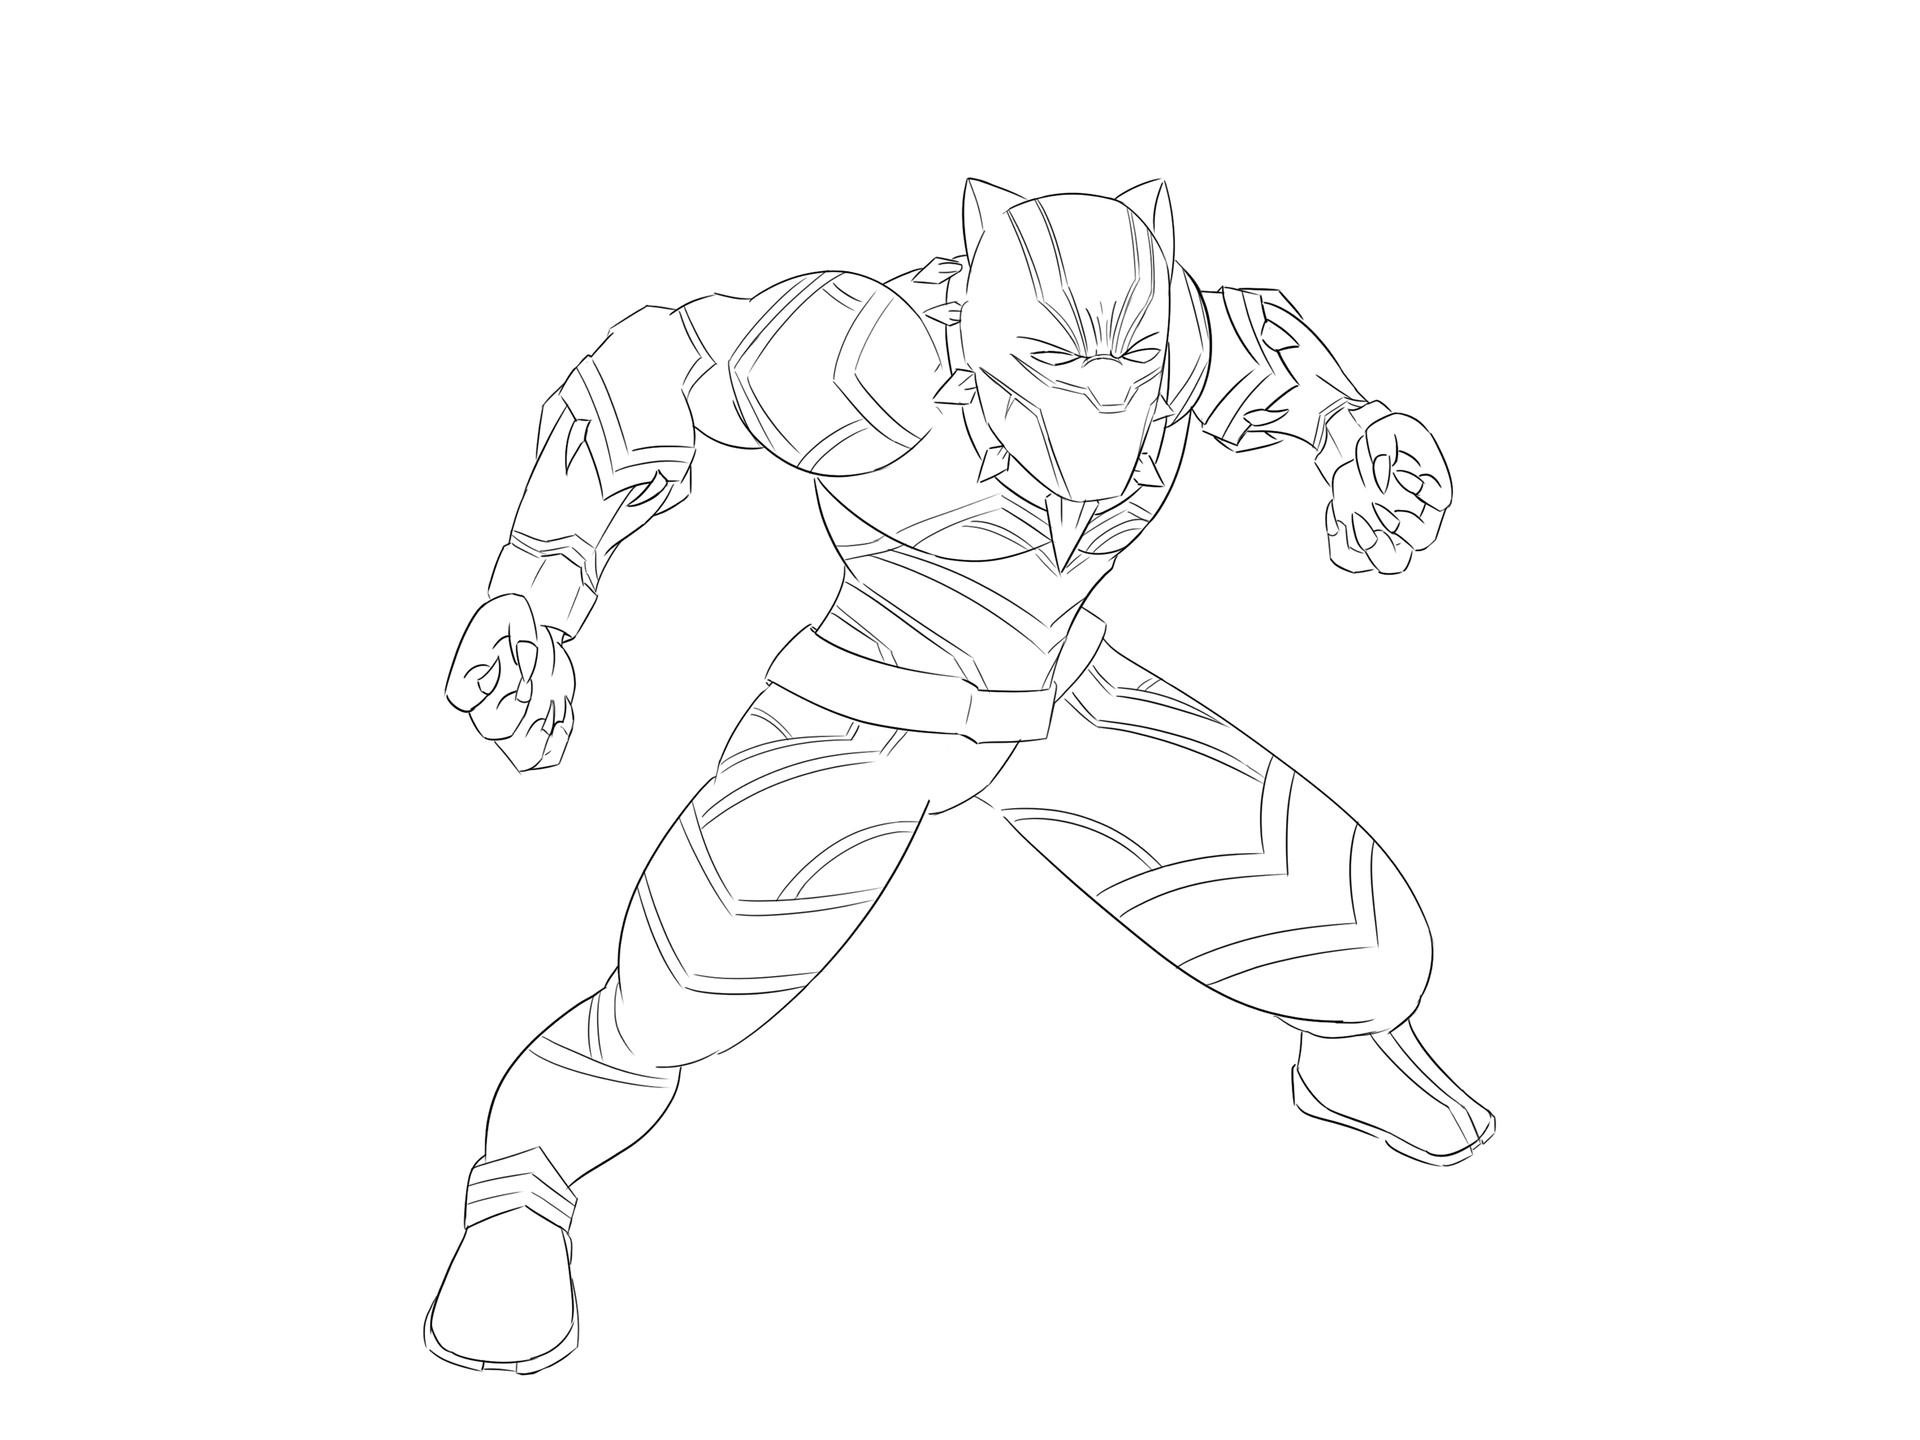 Black Panther Marvel Drawing At GetDrawings.com